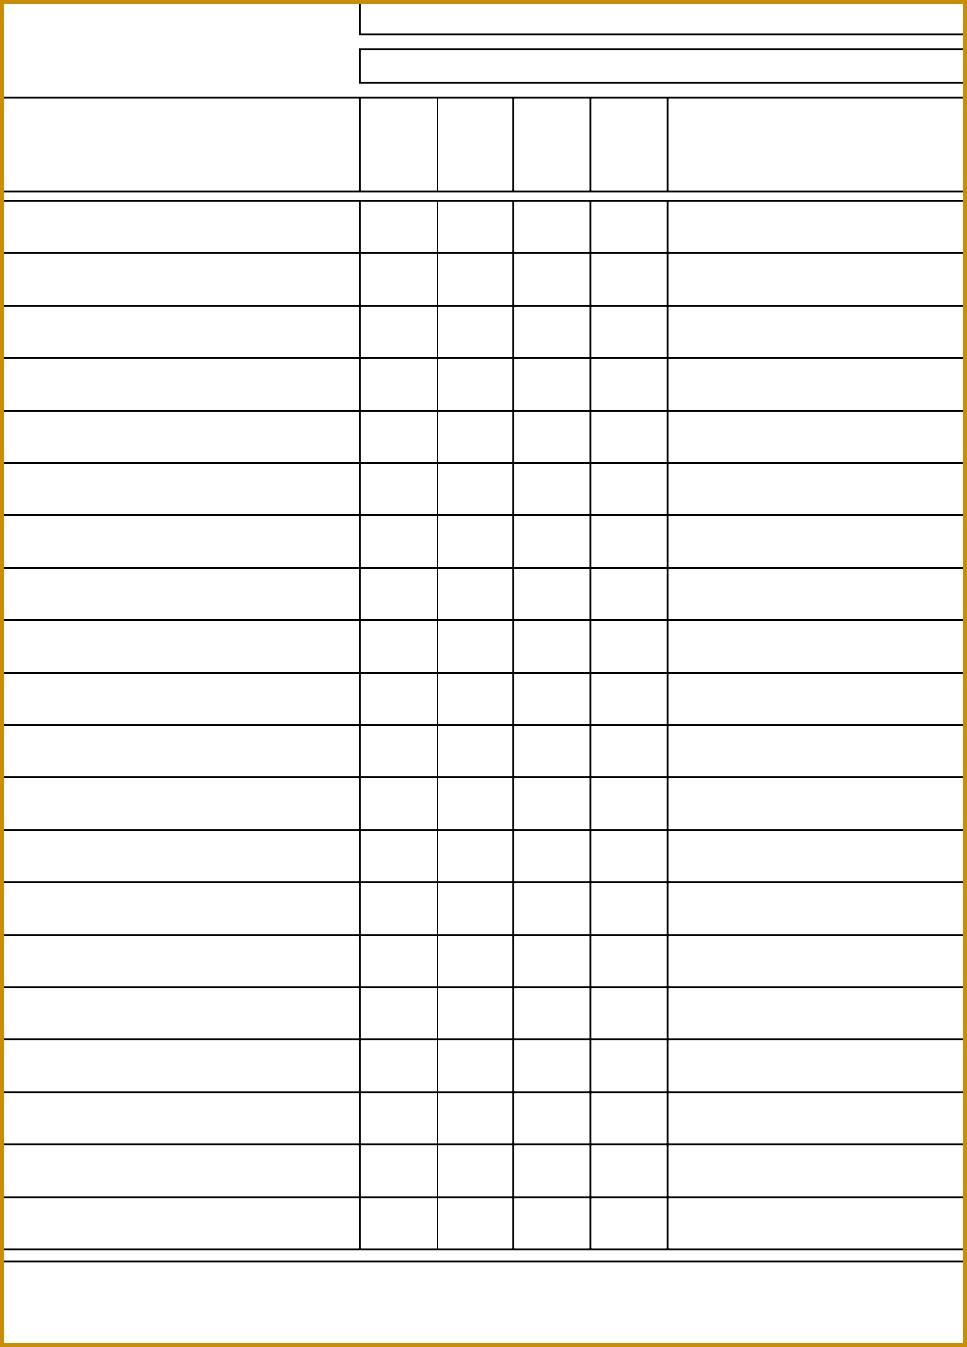 Blank Time Log Sheet Template 1347967